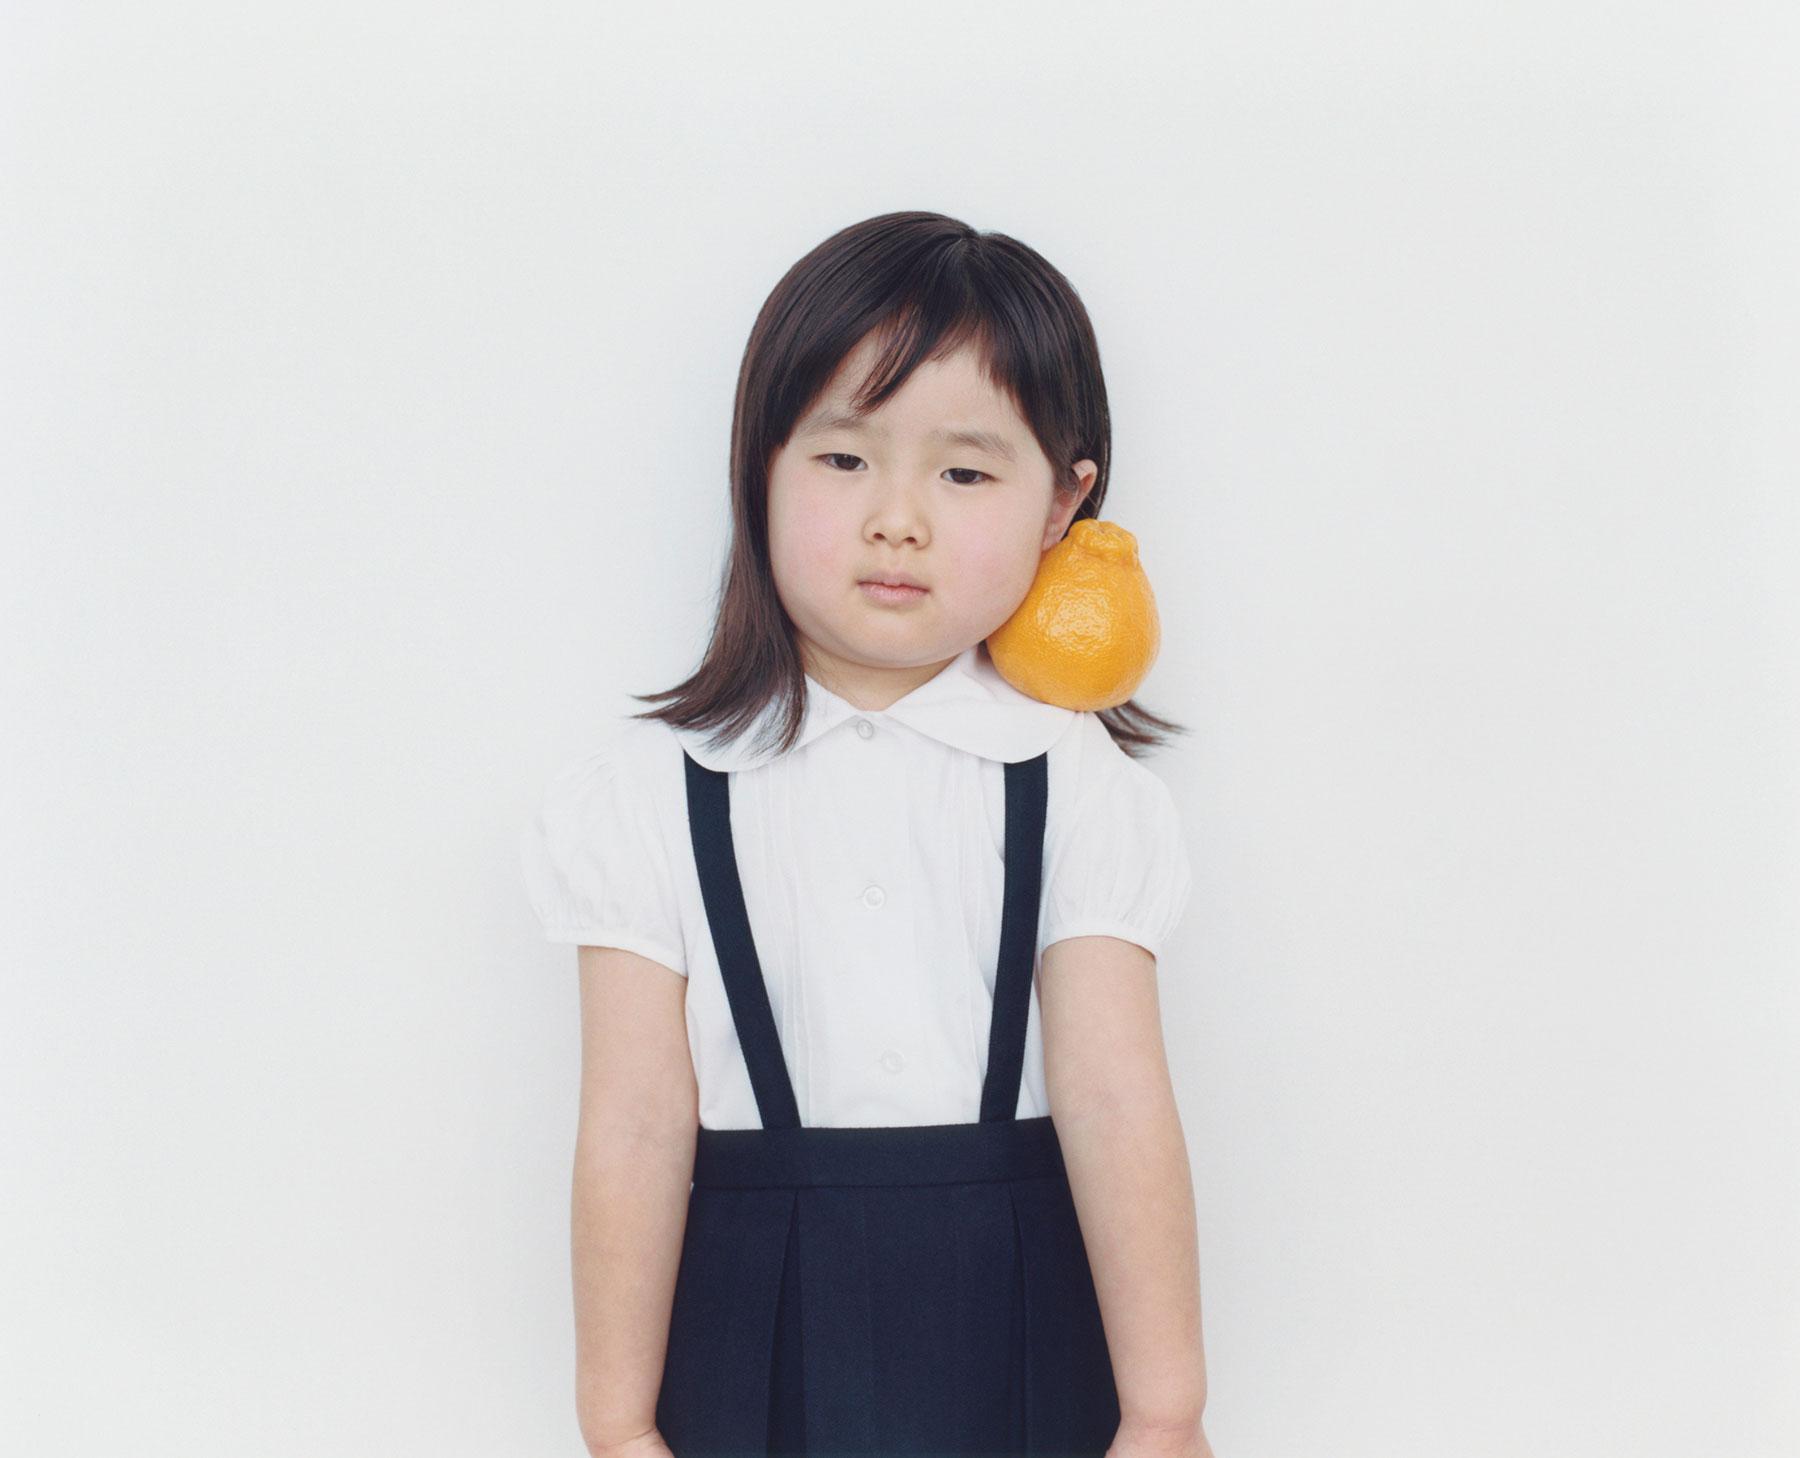 Osamu Yokonami,  1000 Children: Sumo Mandarin No. 11 , 2010-2013  Digital pigment print, 895 x 1105 mm (approx. 34.25 x 43.5 in), edition of 5; 146 x 168 mm (approx. 5.75 x 6.6 in), edition of 10   Inquire